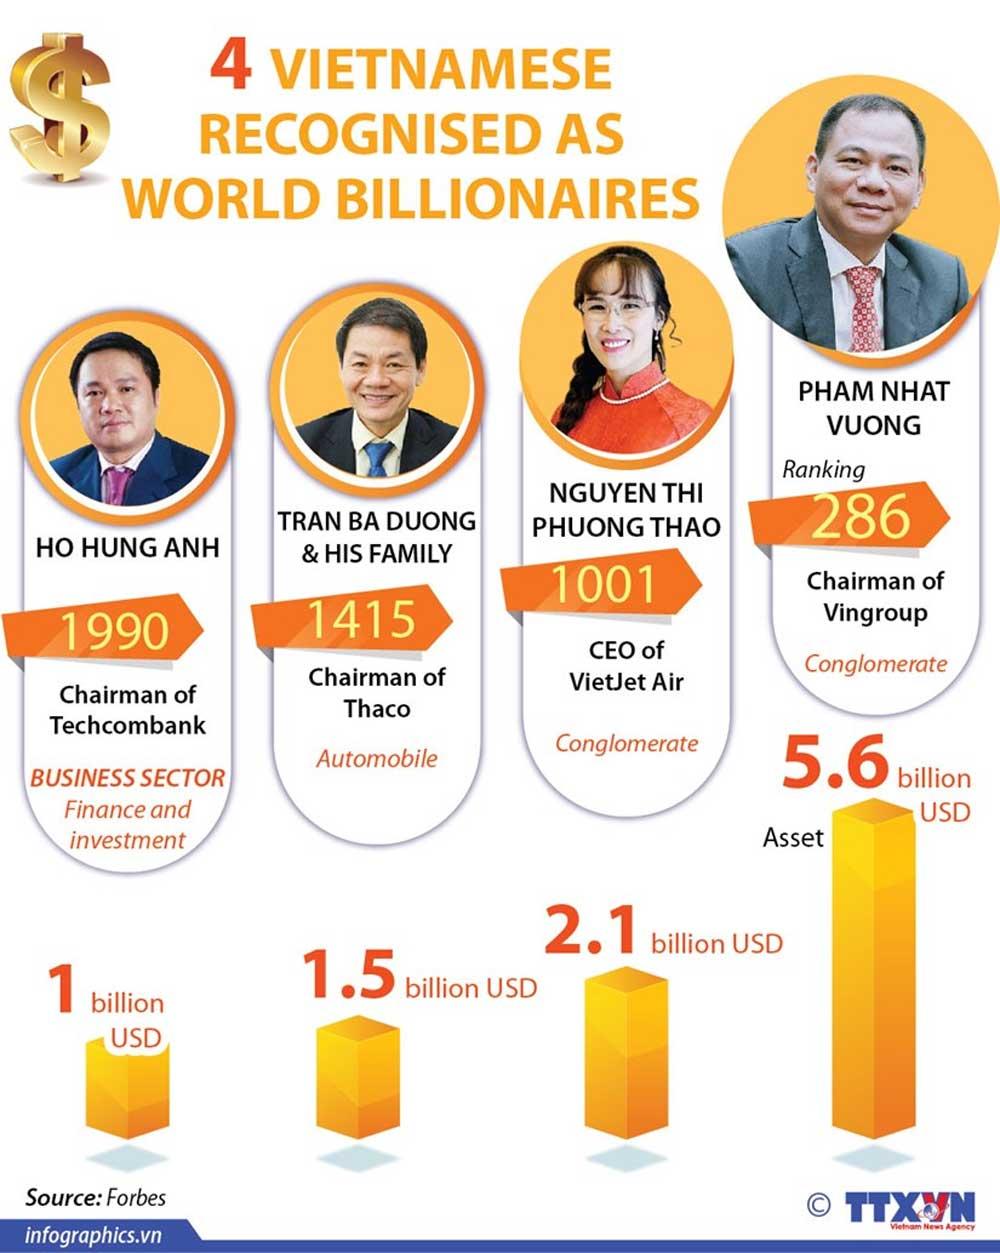 Four Vietnamese, world billionaires, Vietnamese business people, world billionaires, prestigious American  magazine, Forbes